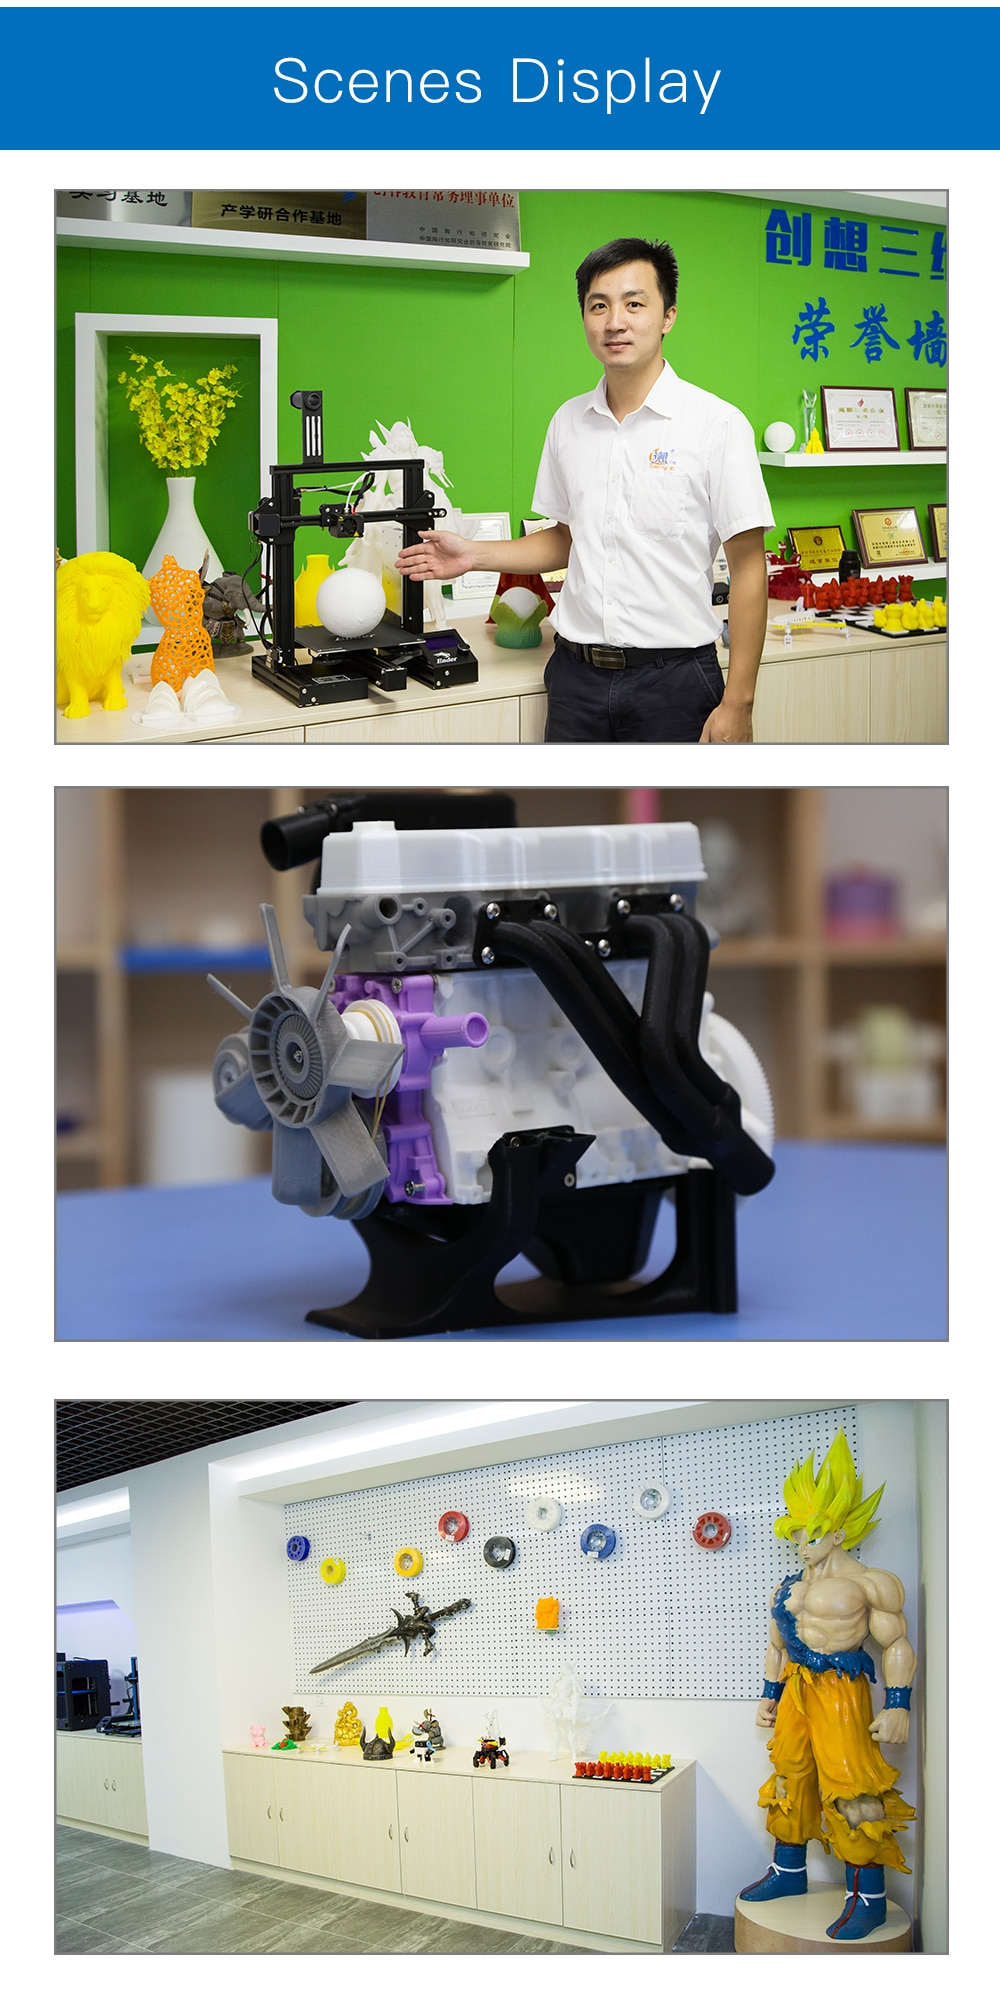 Ender-3 PRO Creality 3D Printer